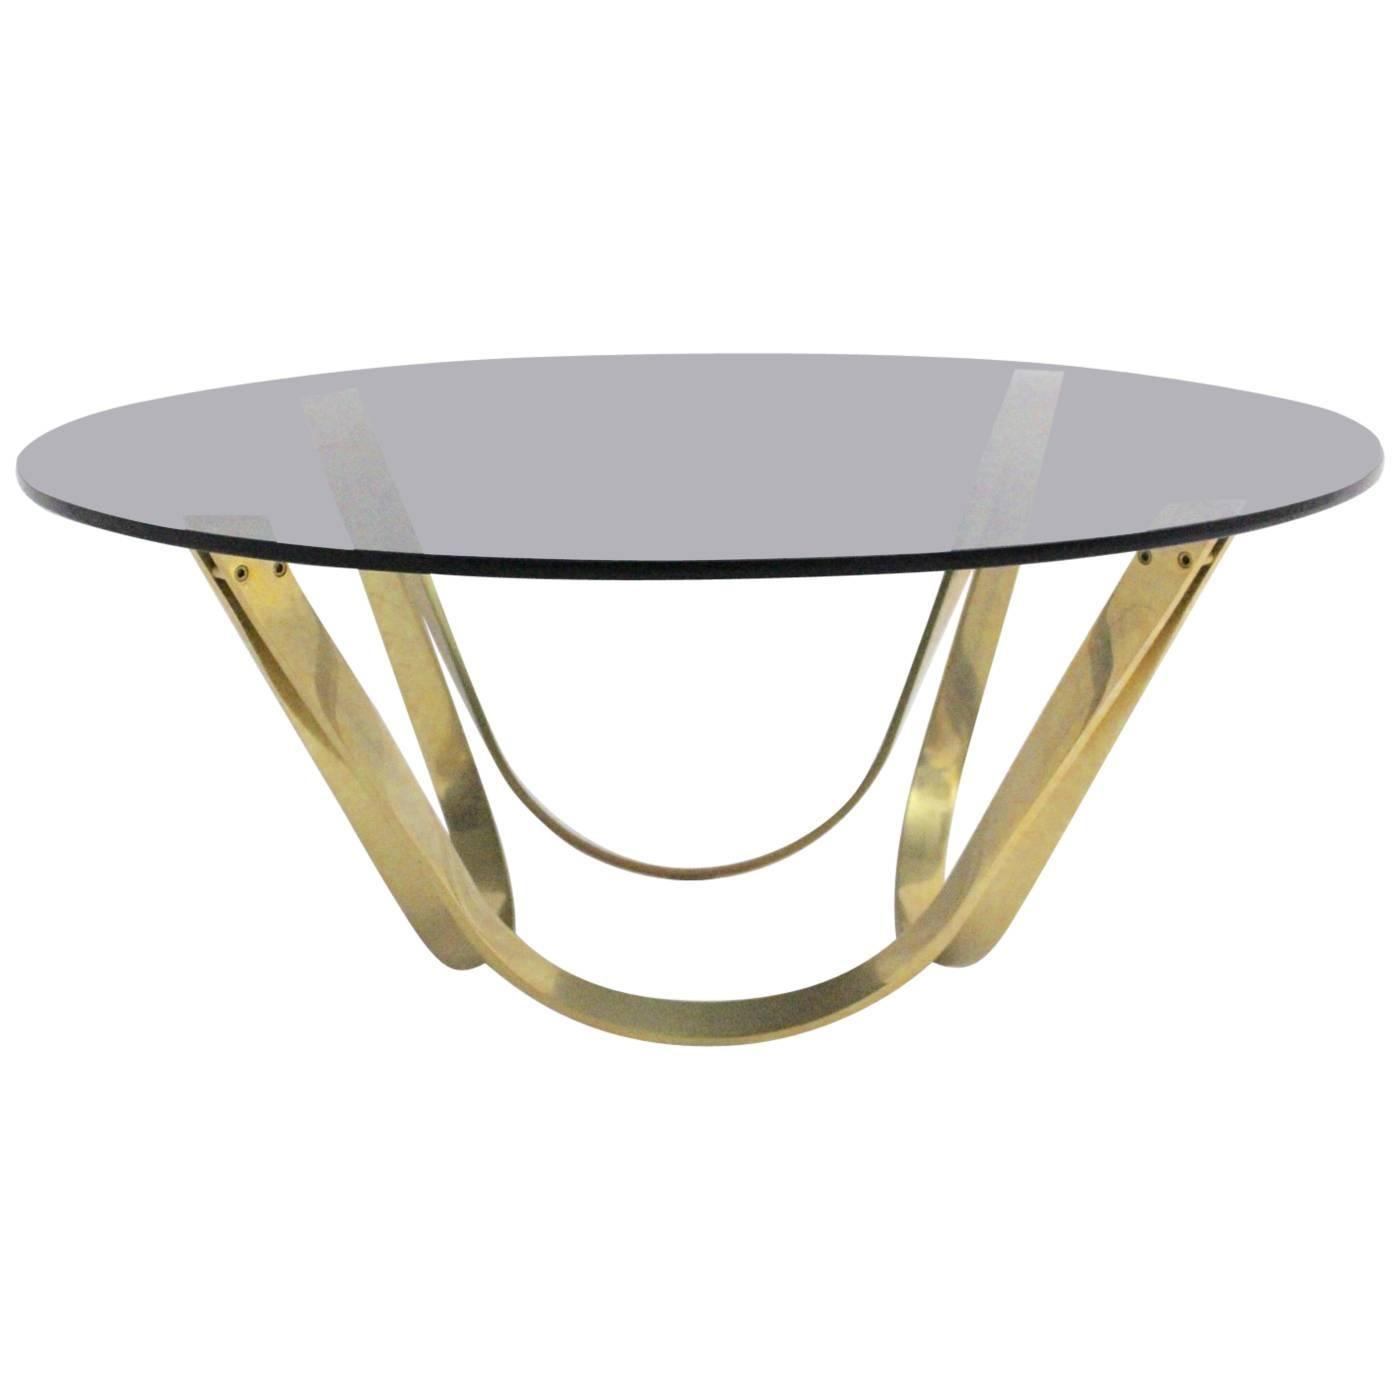 Brass Vintage Coffee Table Mid-Century Modern, 1960s